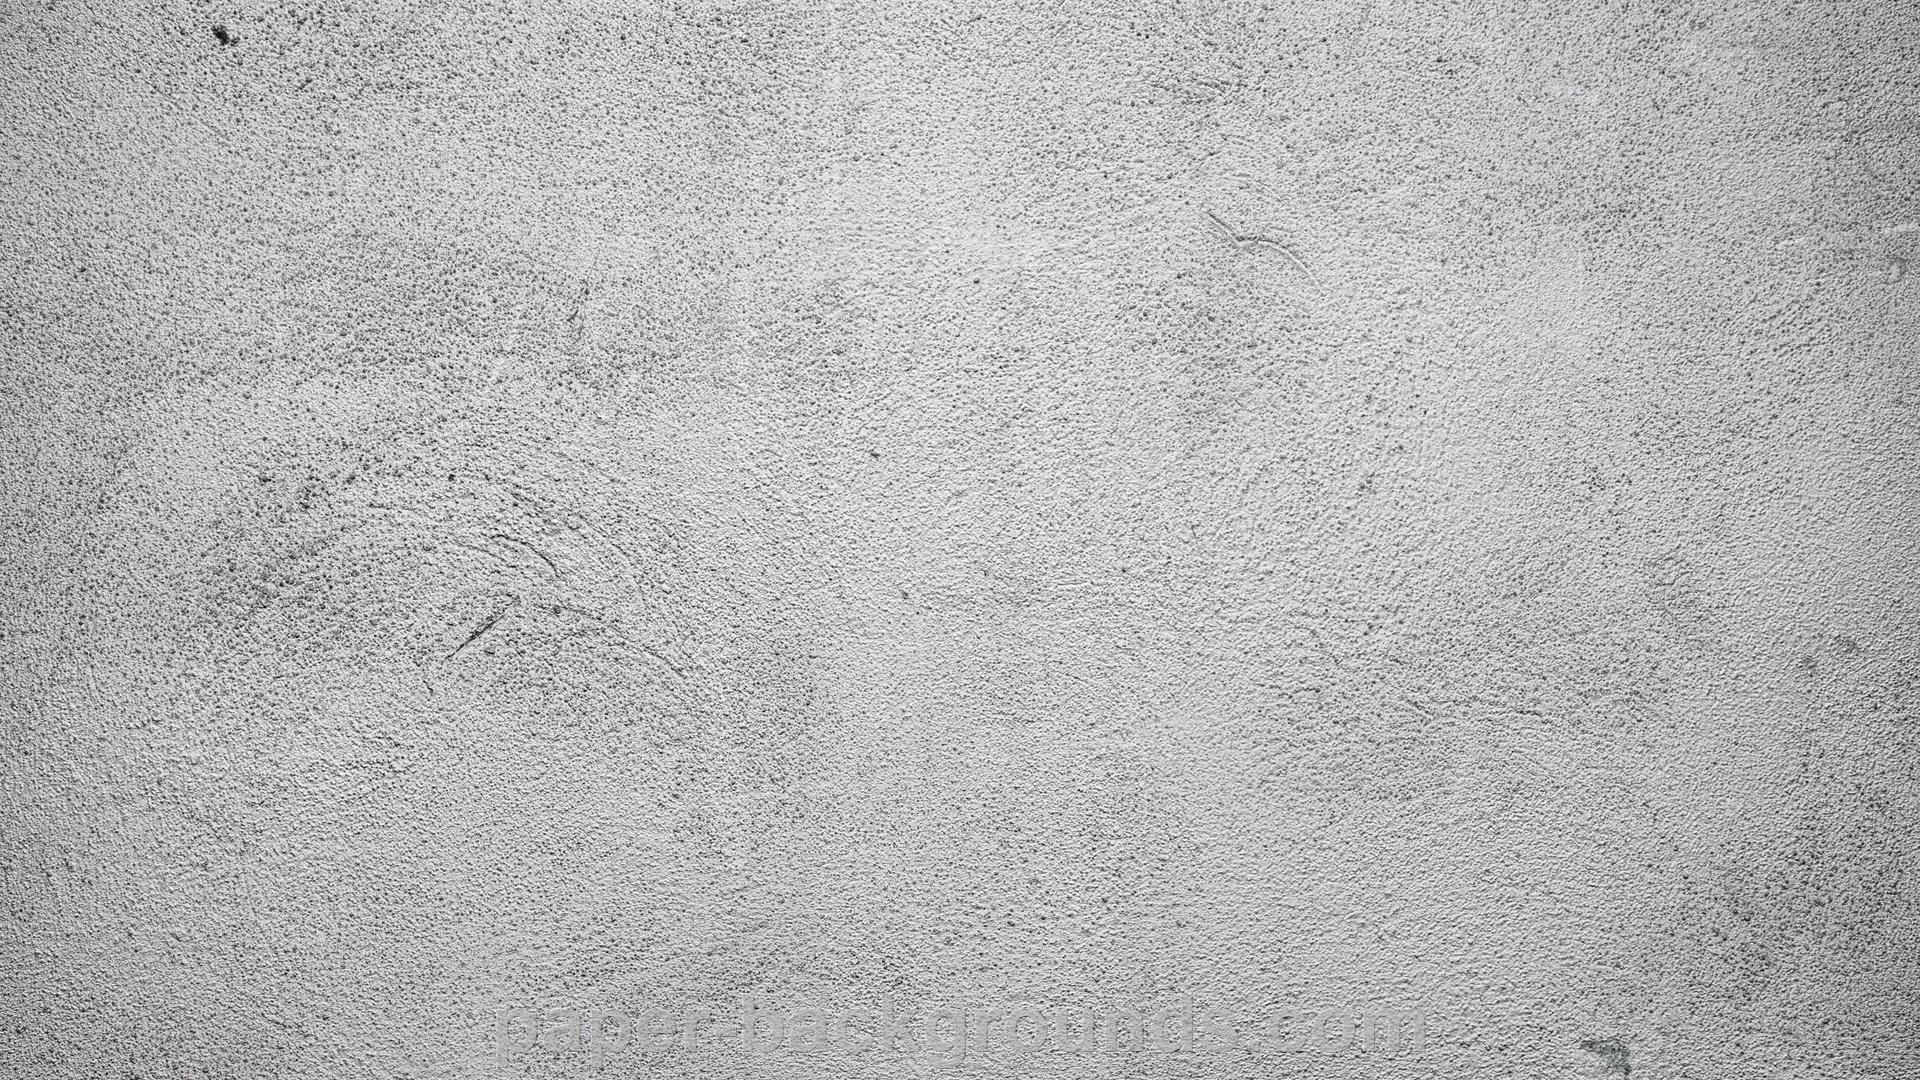 white-gray-concrete-wall-texture-hd.jpg - Frank Marino Baker - Drip ...